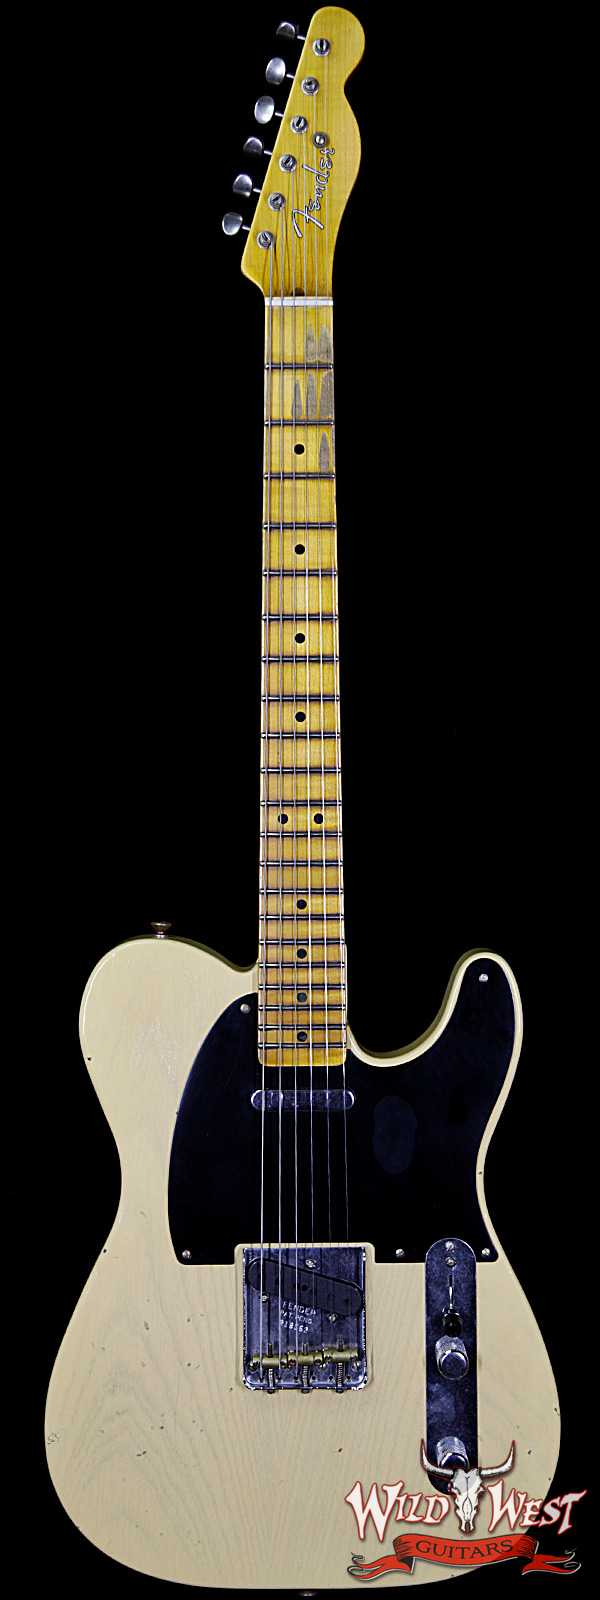 Summer Event #13 Fender Custom Shop 1951 Nocaster Journeyman Relic Faded Nocaster Blonde